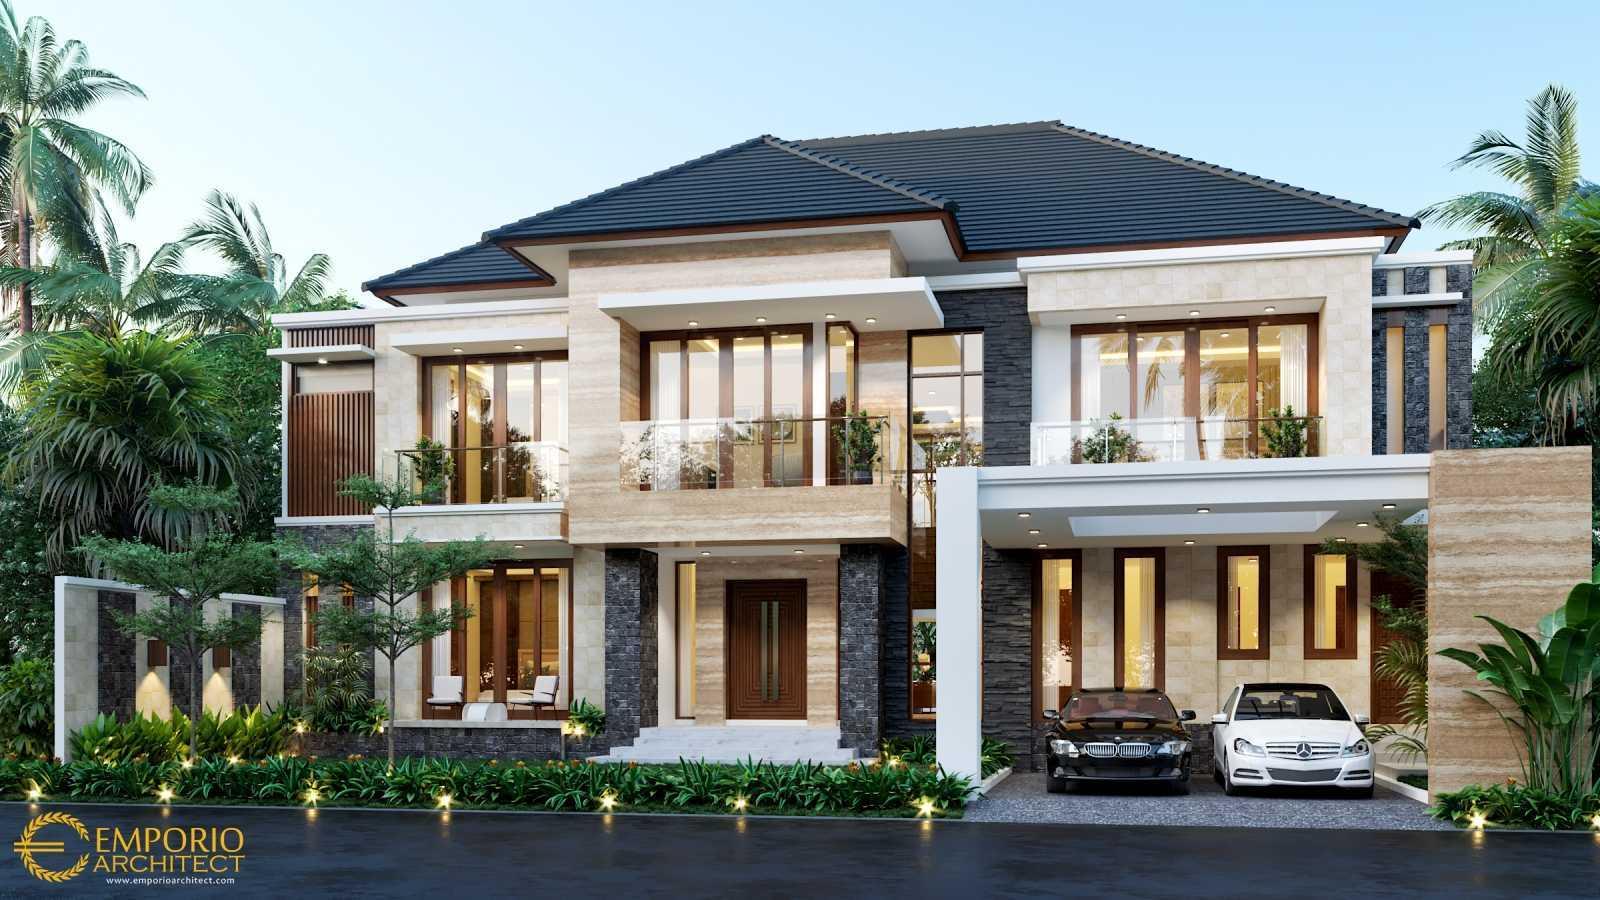 Emporio Architect Desain Rumah Modern Tropis 541 @ Sulawesi Sulawesi, Indonesia Sulawesi, Indonesia Emporio-Architect-Desain-Rumah-Modern-Tropis-541-Sulawesi   78184